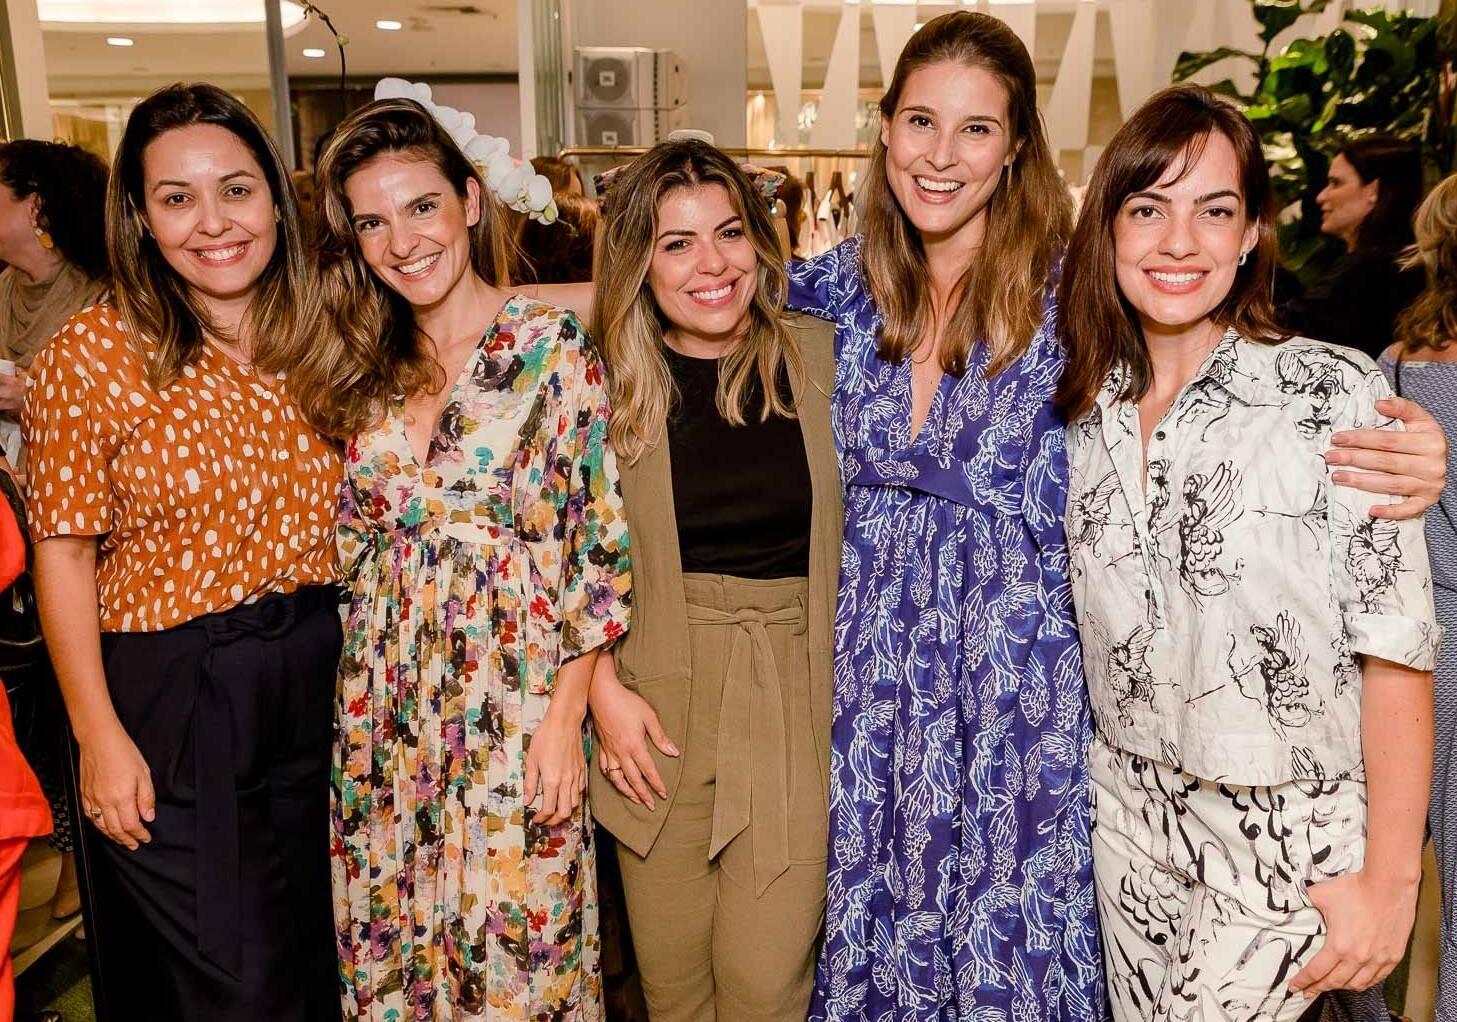 Amanda Alves, Marcela Jobim, Pauline Carvalho, Nina Spinardi e Fernanda Barreto /Foto: Bruno Ryfer